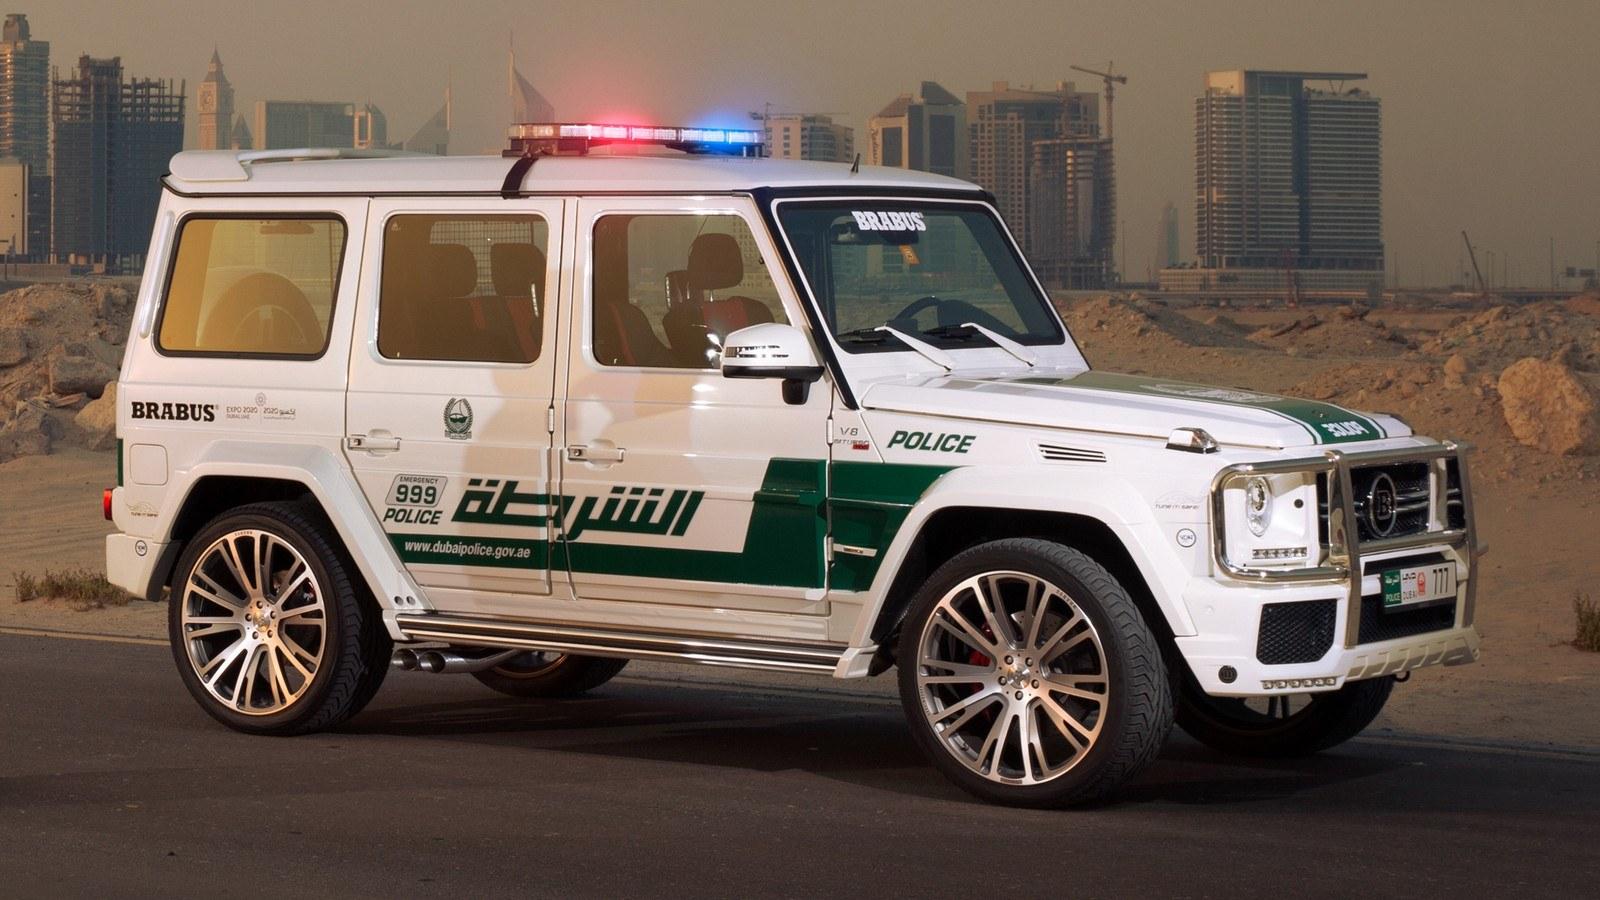 brabus_700_widestar_police_5